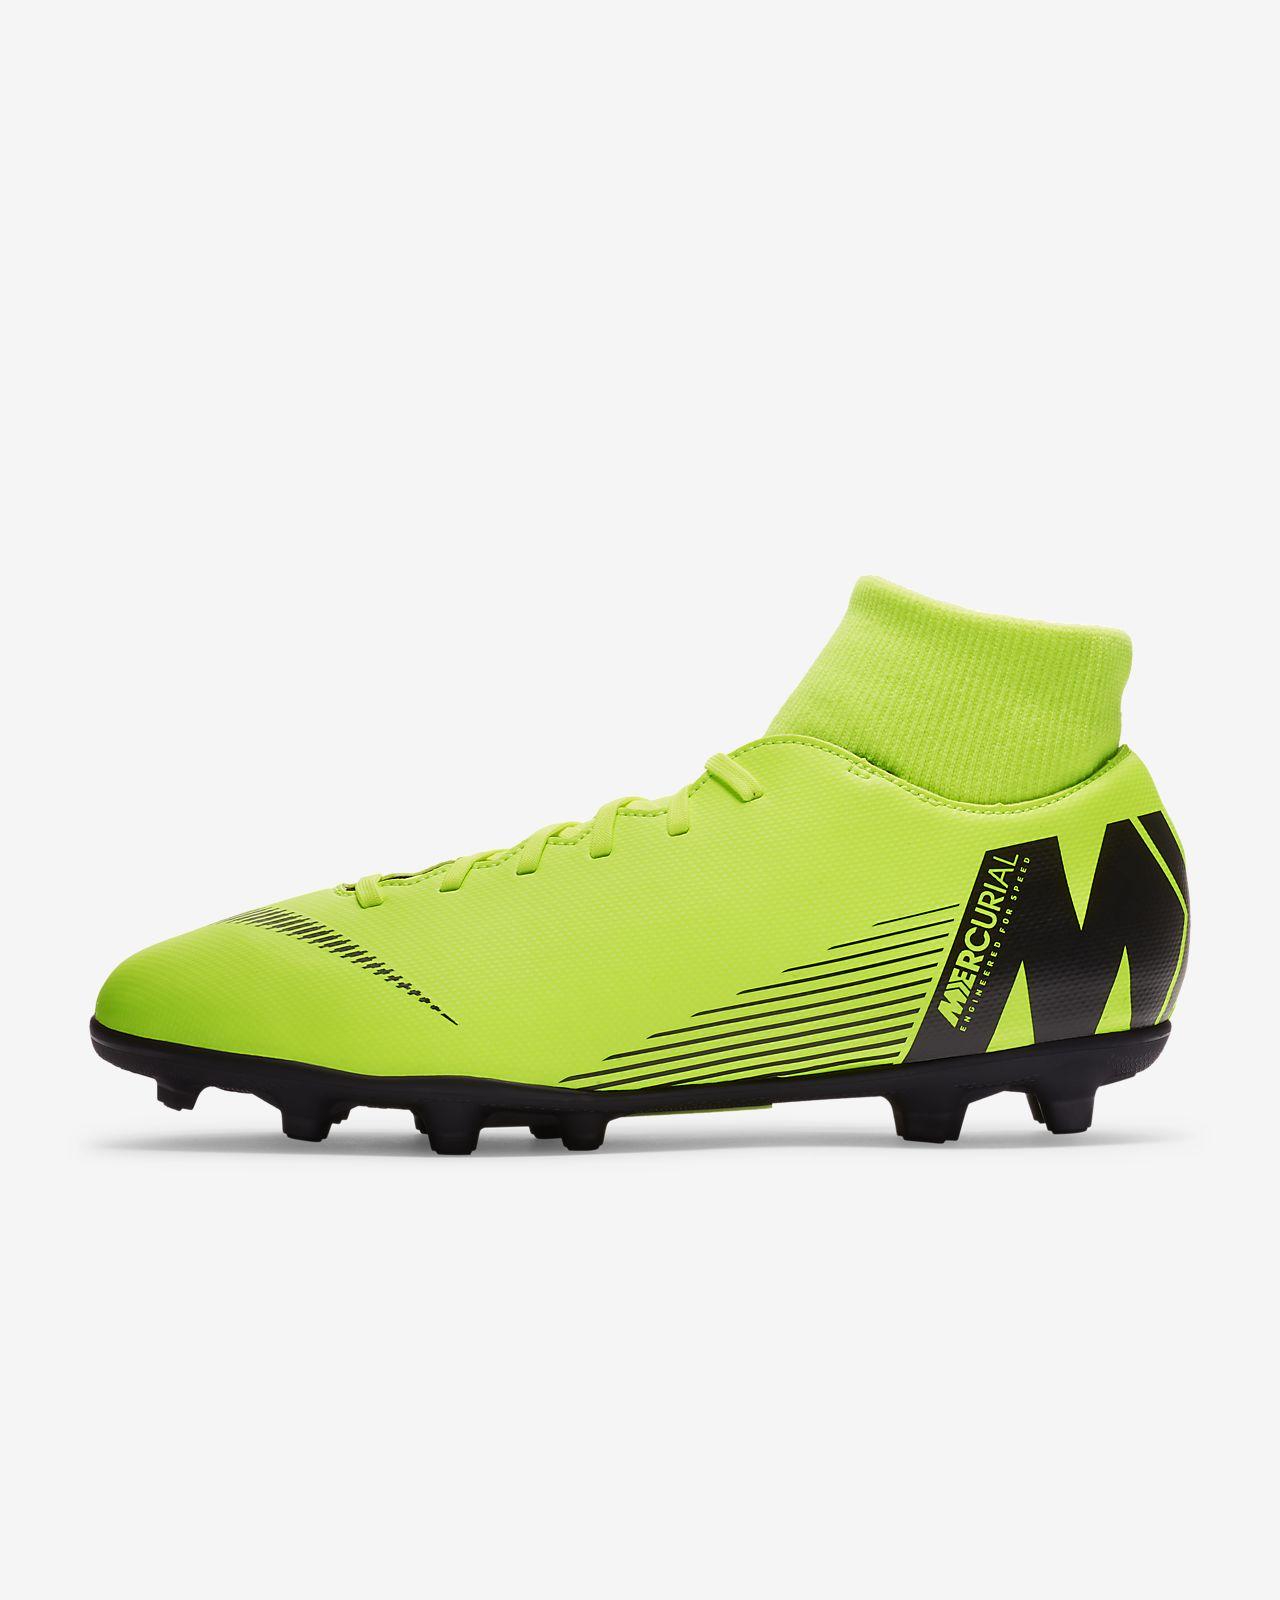 Scarpa da calcio multiterreno Nike Mercurial Superfly VI Club. Nike ... bda7f68c79f